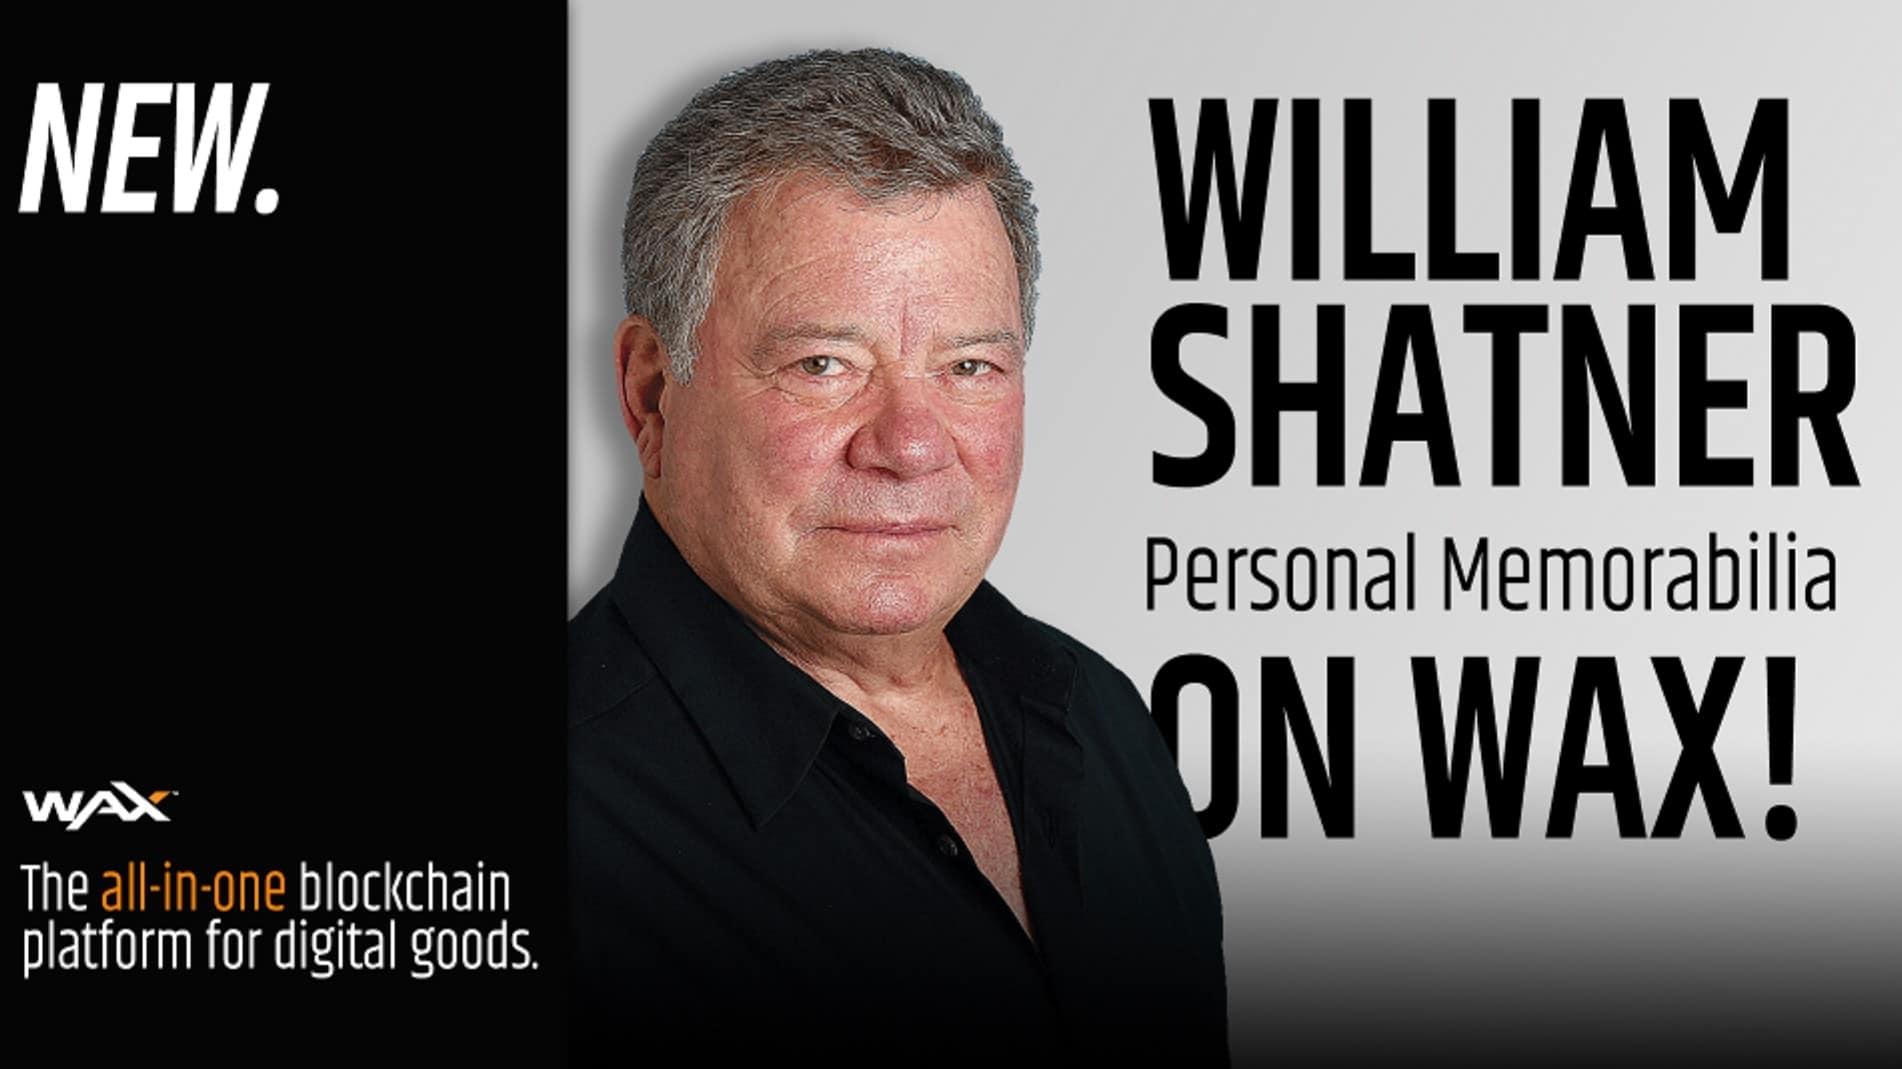 William Shatner NFTs on Wax